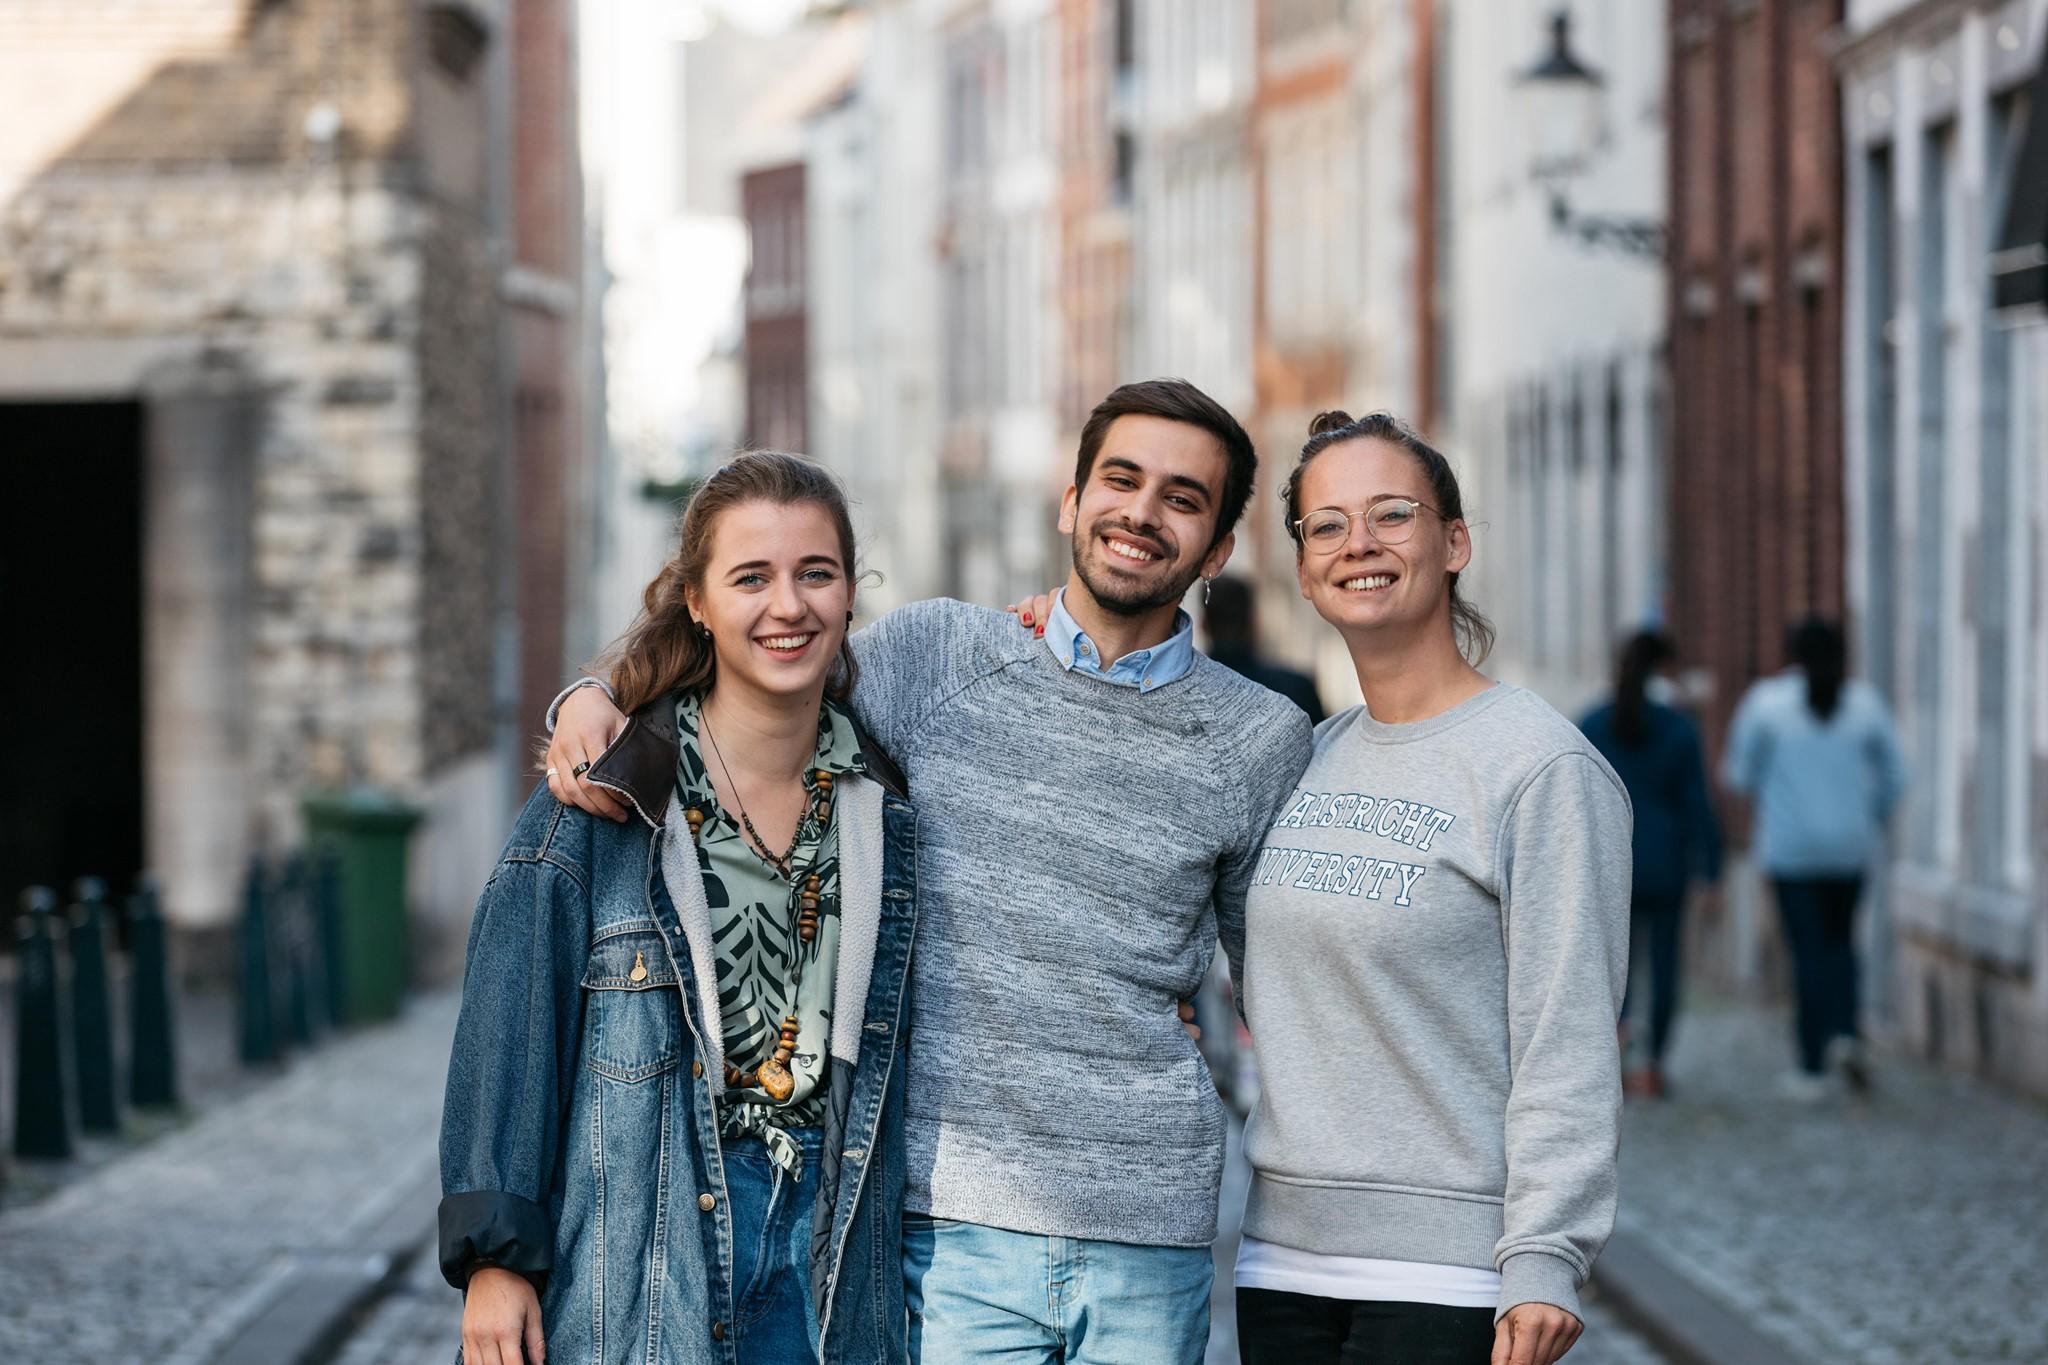 Студенты Maastricht University